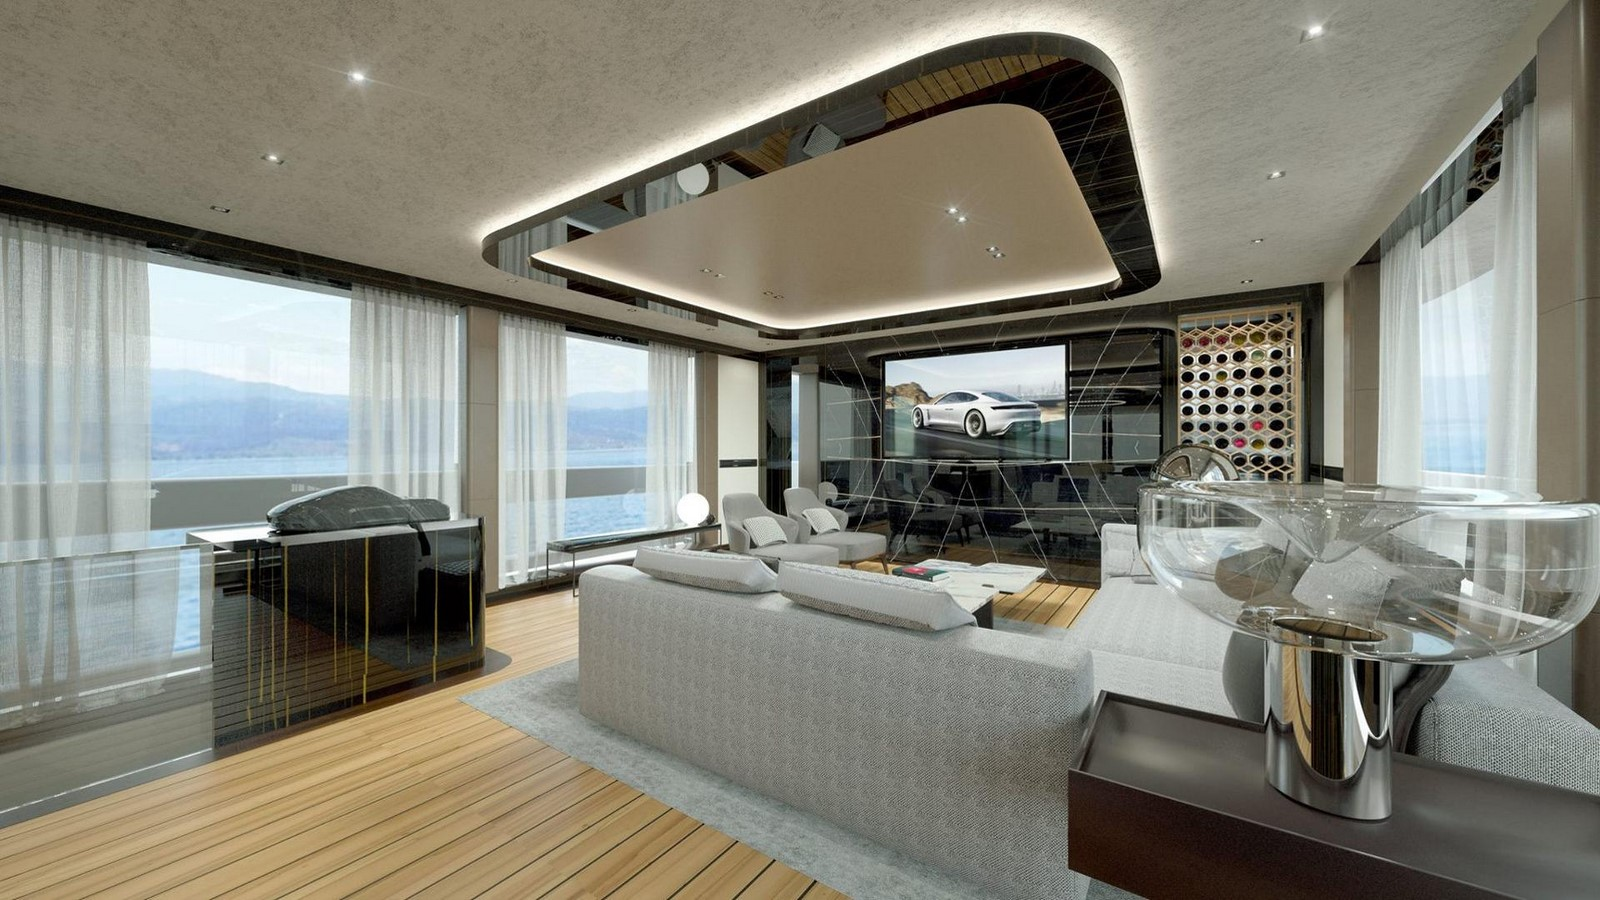 porsche-design-dynamiq-gtt-115-hybrid-superyacht (6)